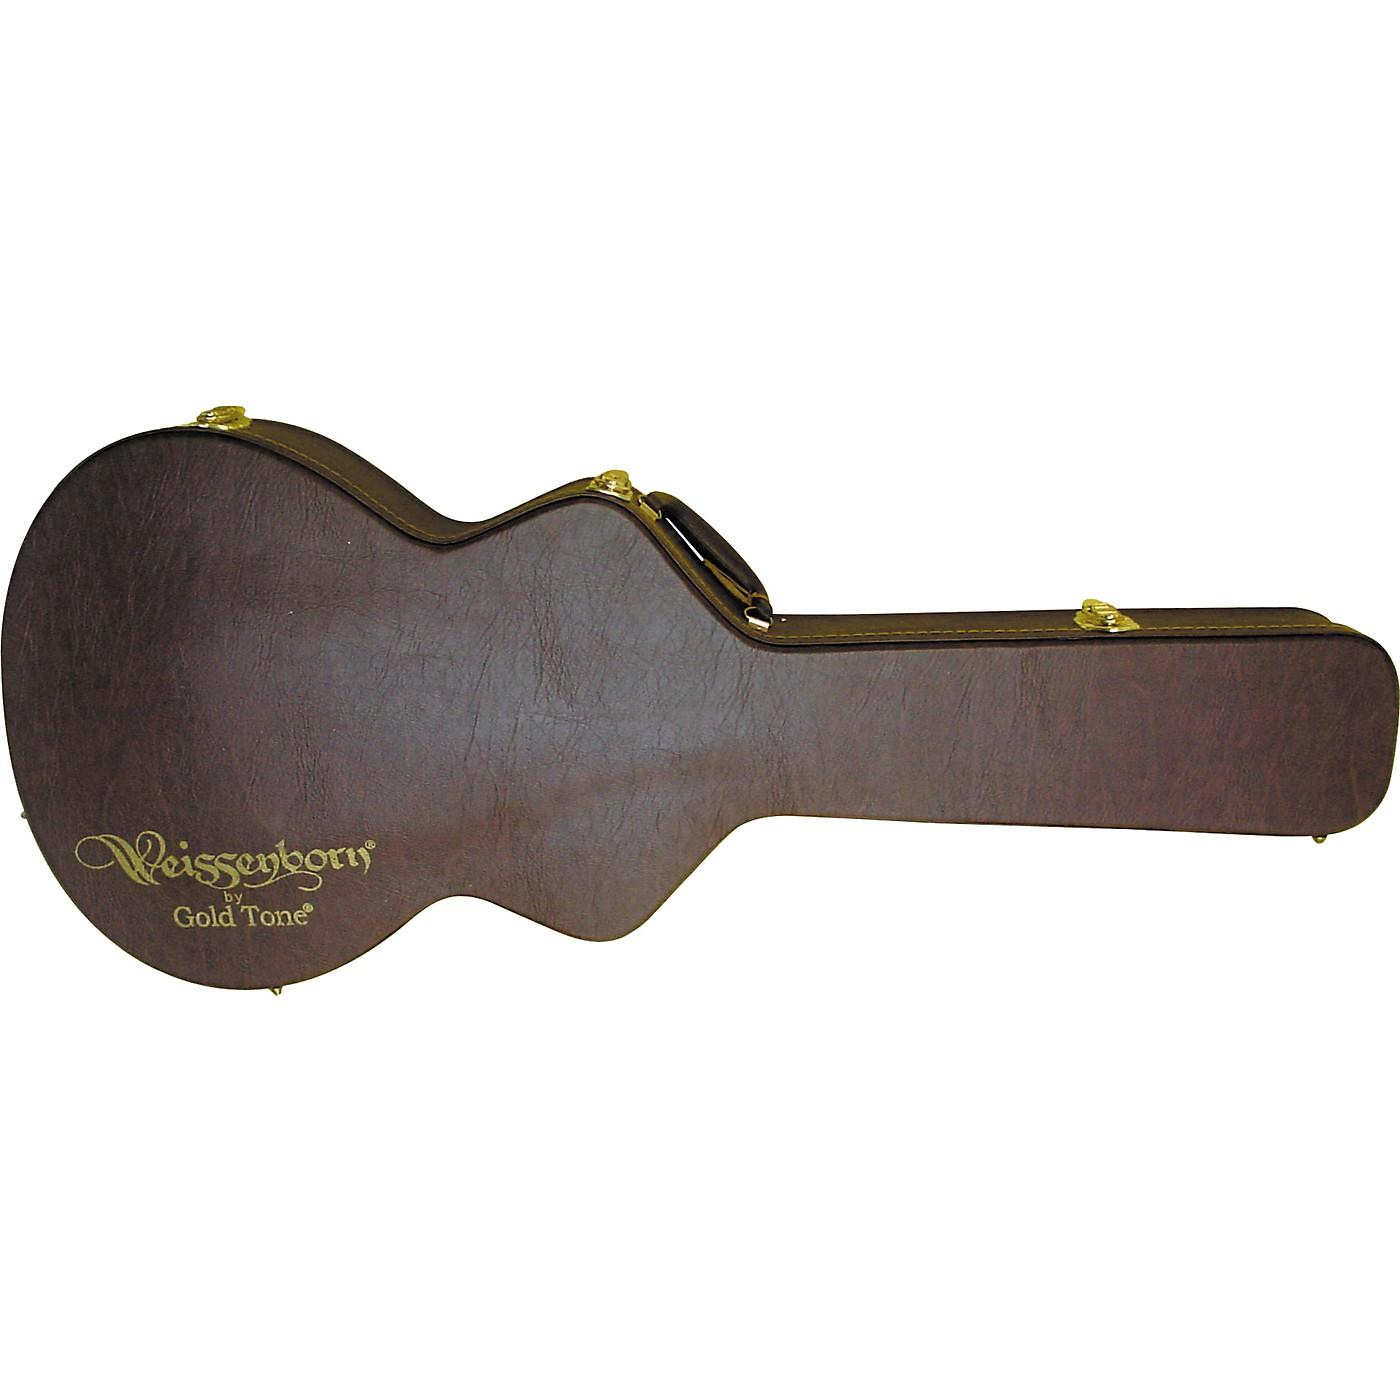 Gold Tone Weissenborn Hard Case thumbnail